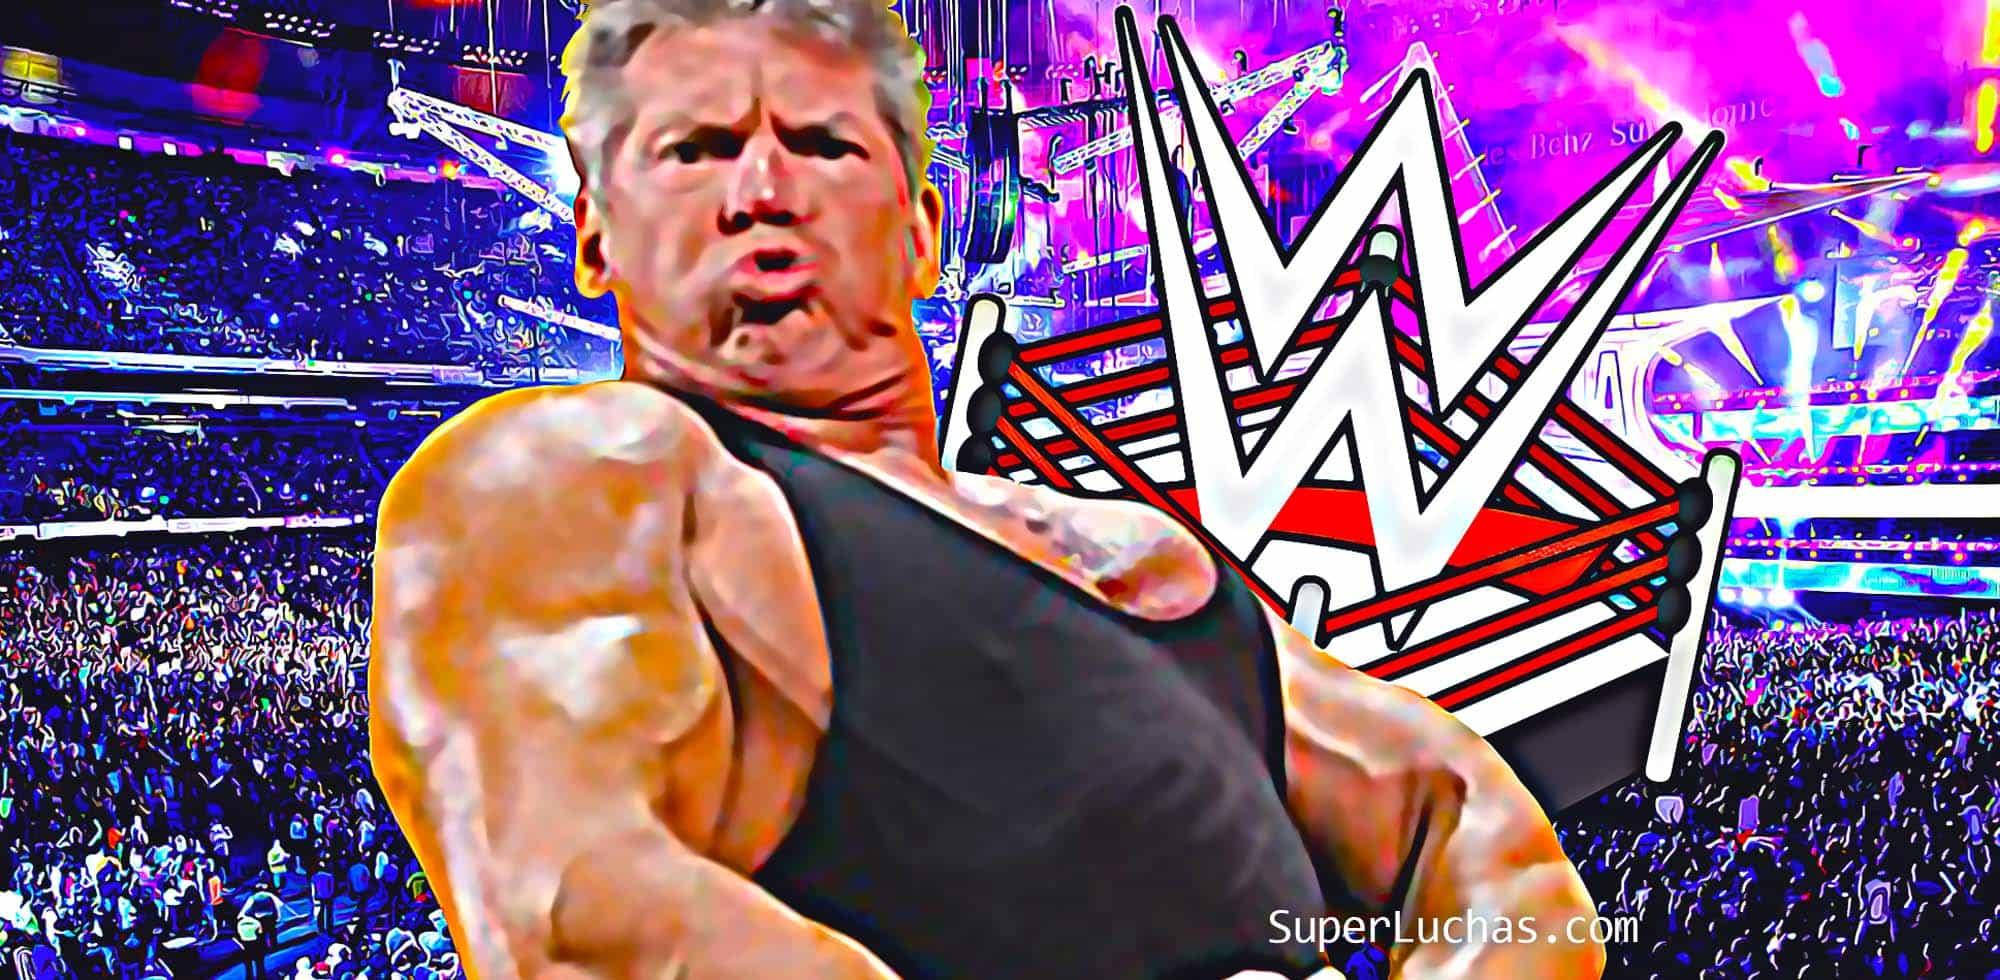 ¿El problema de los ratings de WWE? Lucha libre basura 3